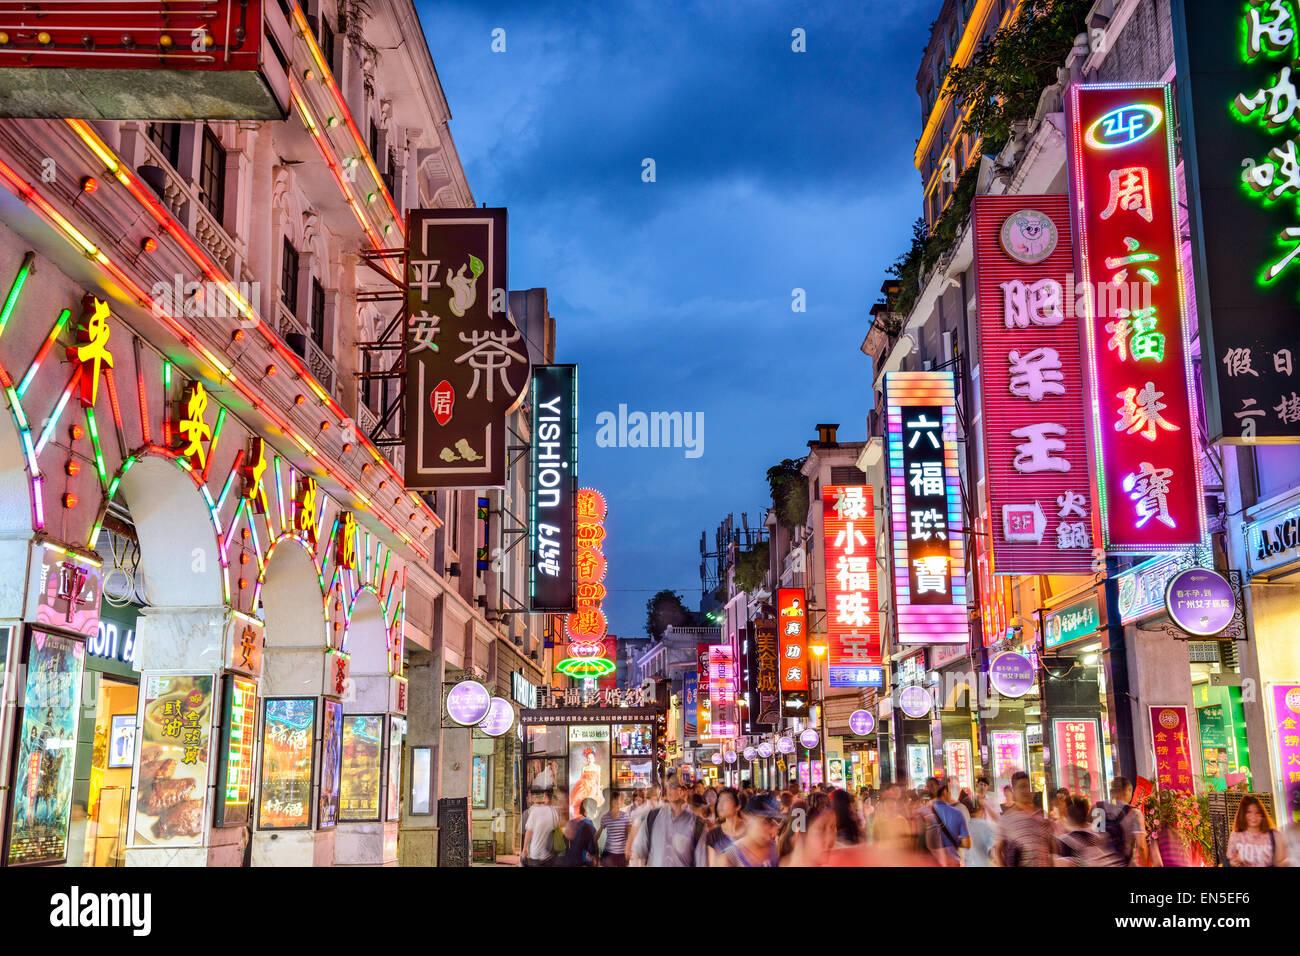 Les piétons traversent la rue piétonne Shangxiajiu à Guangzhou, Chine. Photo Stock